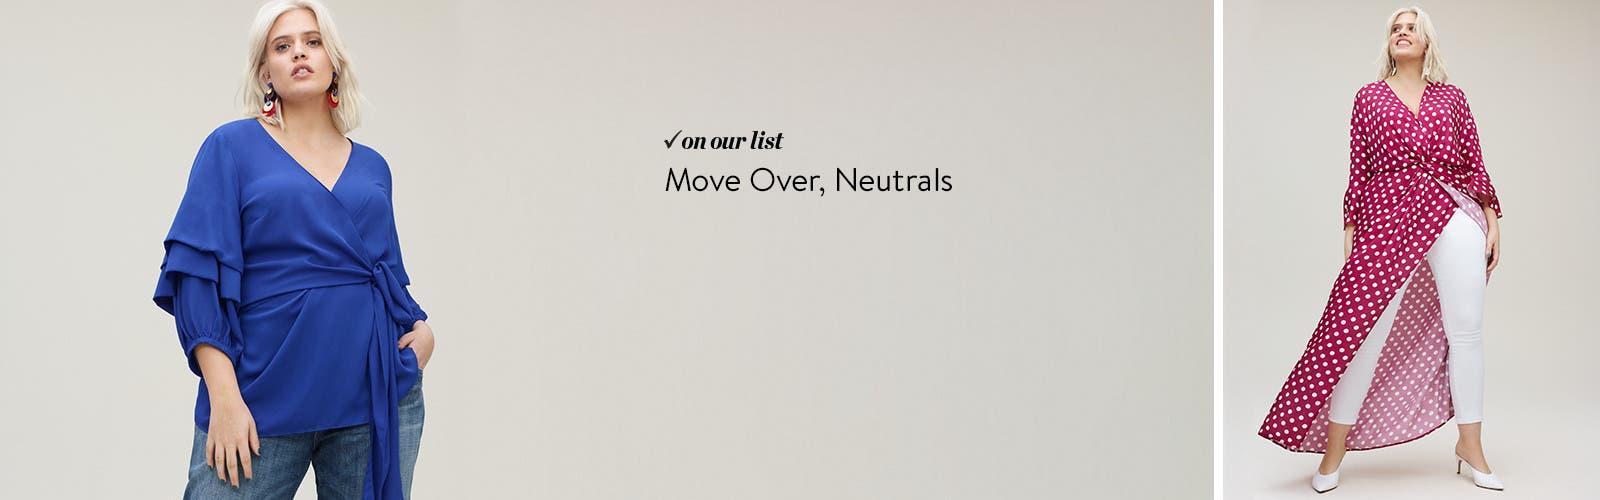 Move over, neutrals.